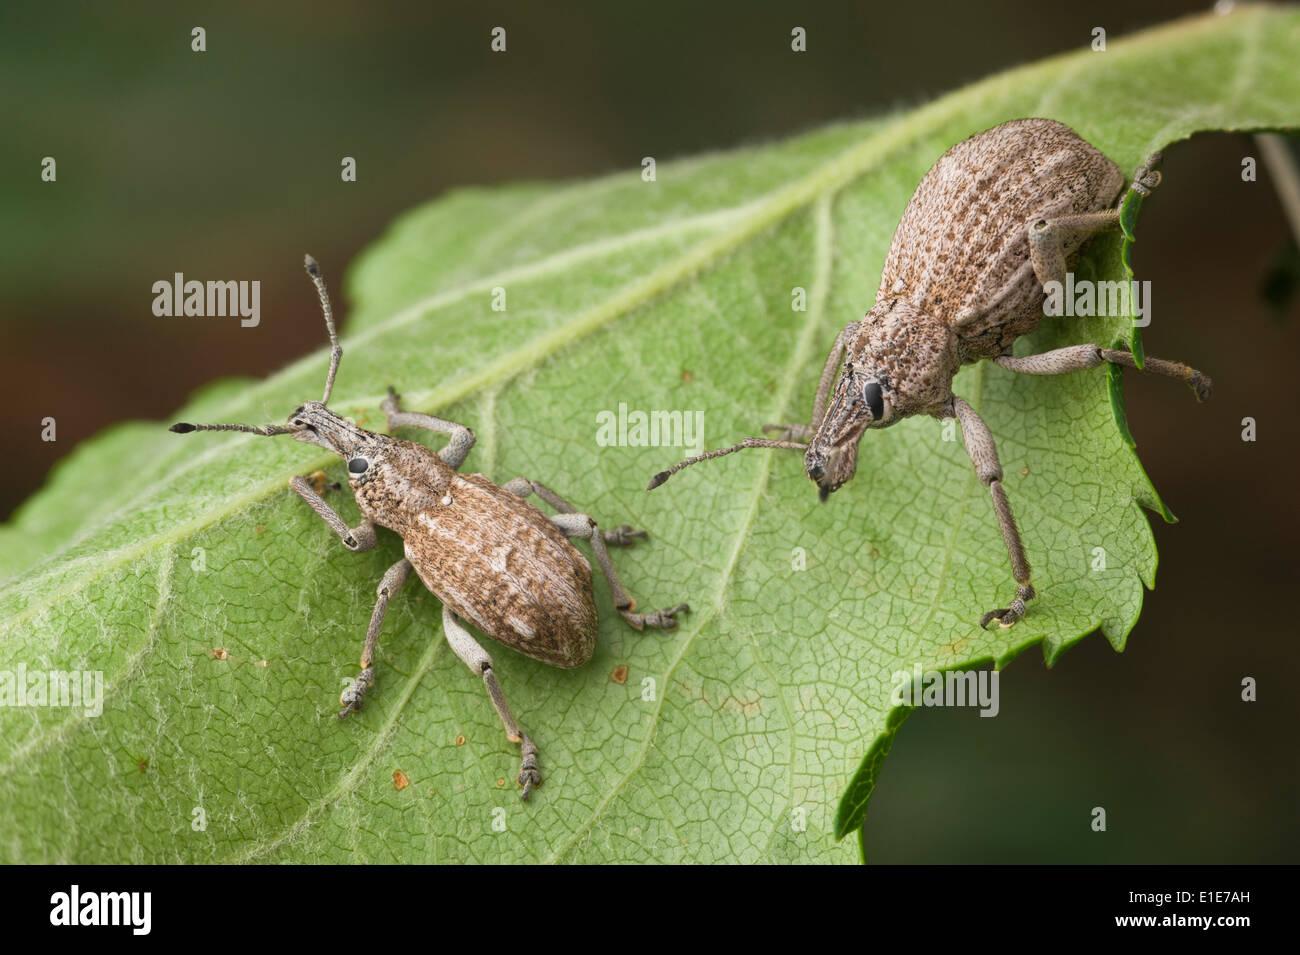 Obstbaum Wurzel Rüsselkäfer, auch bekannt als Apple Wurzel Borer, ist eine native Insekt Australiens Stockbild